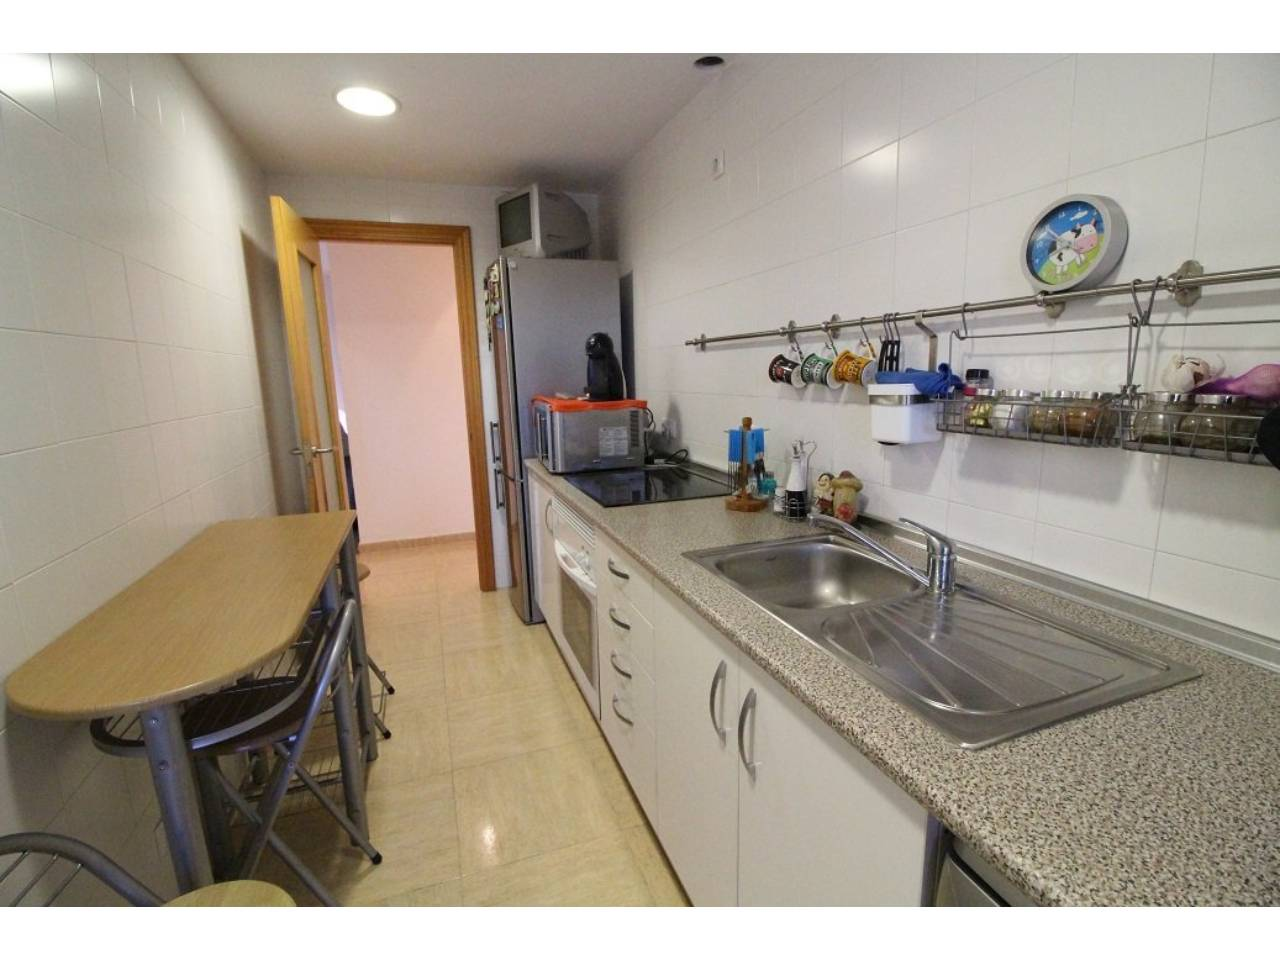 Flat  Ronda. Superf. 80 m²,  3 habitaciones (3 dobles),  2 baños, cocina, lav